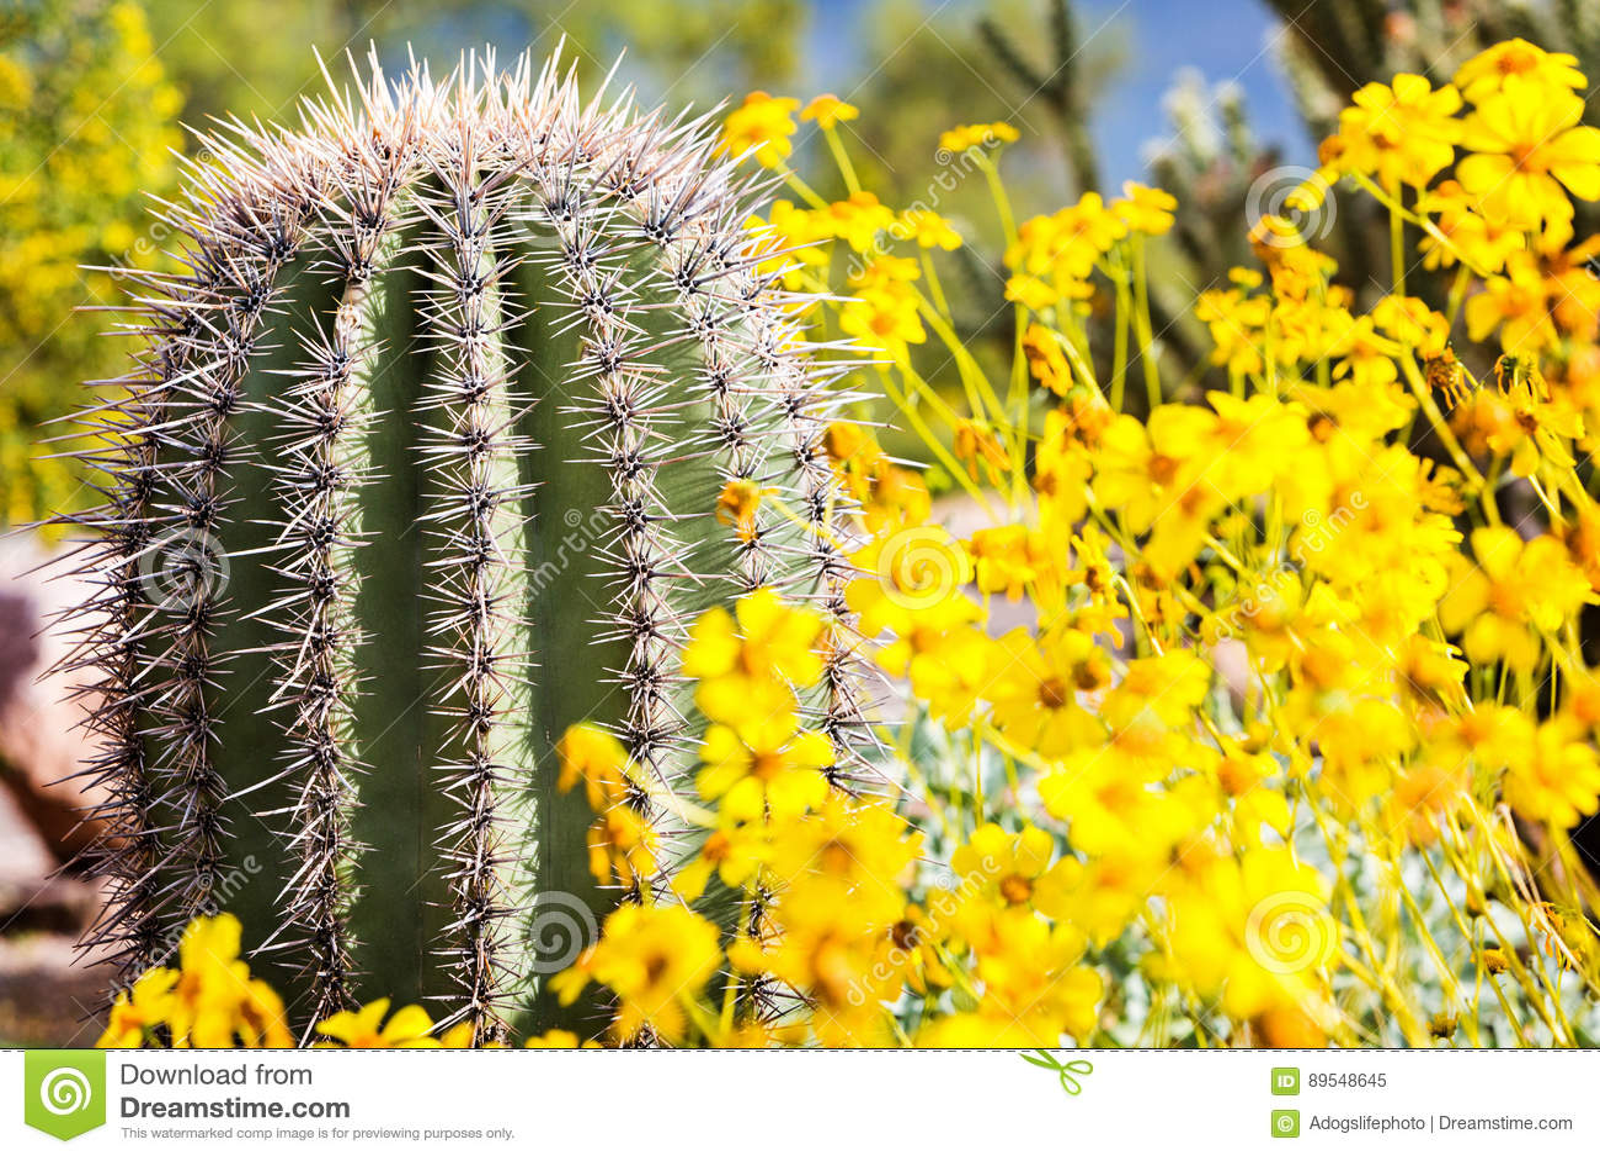 Arizona trummakaktus med vildblommor